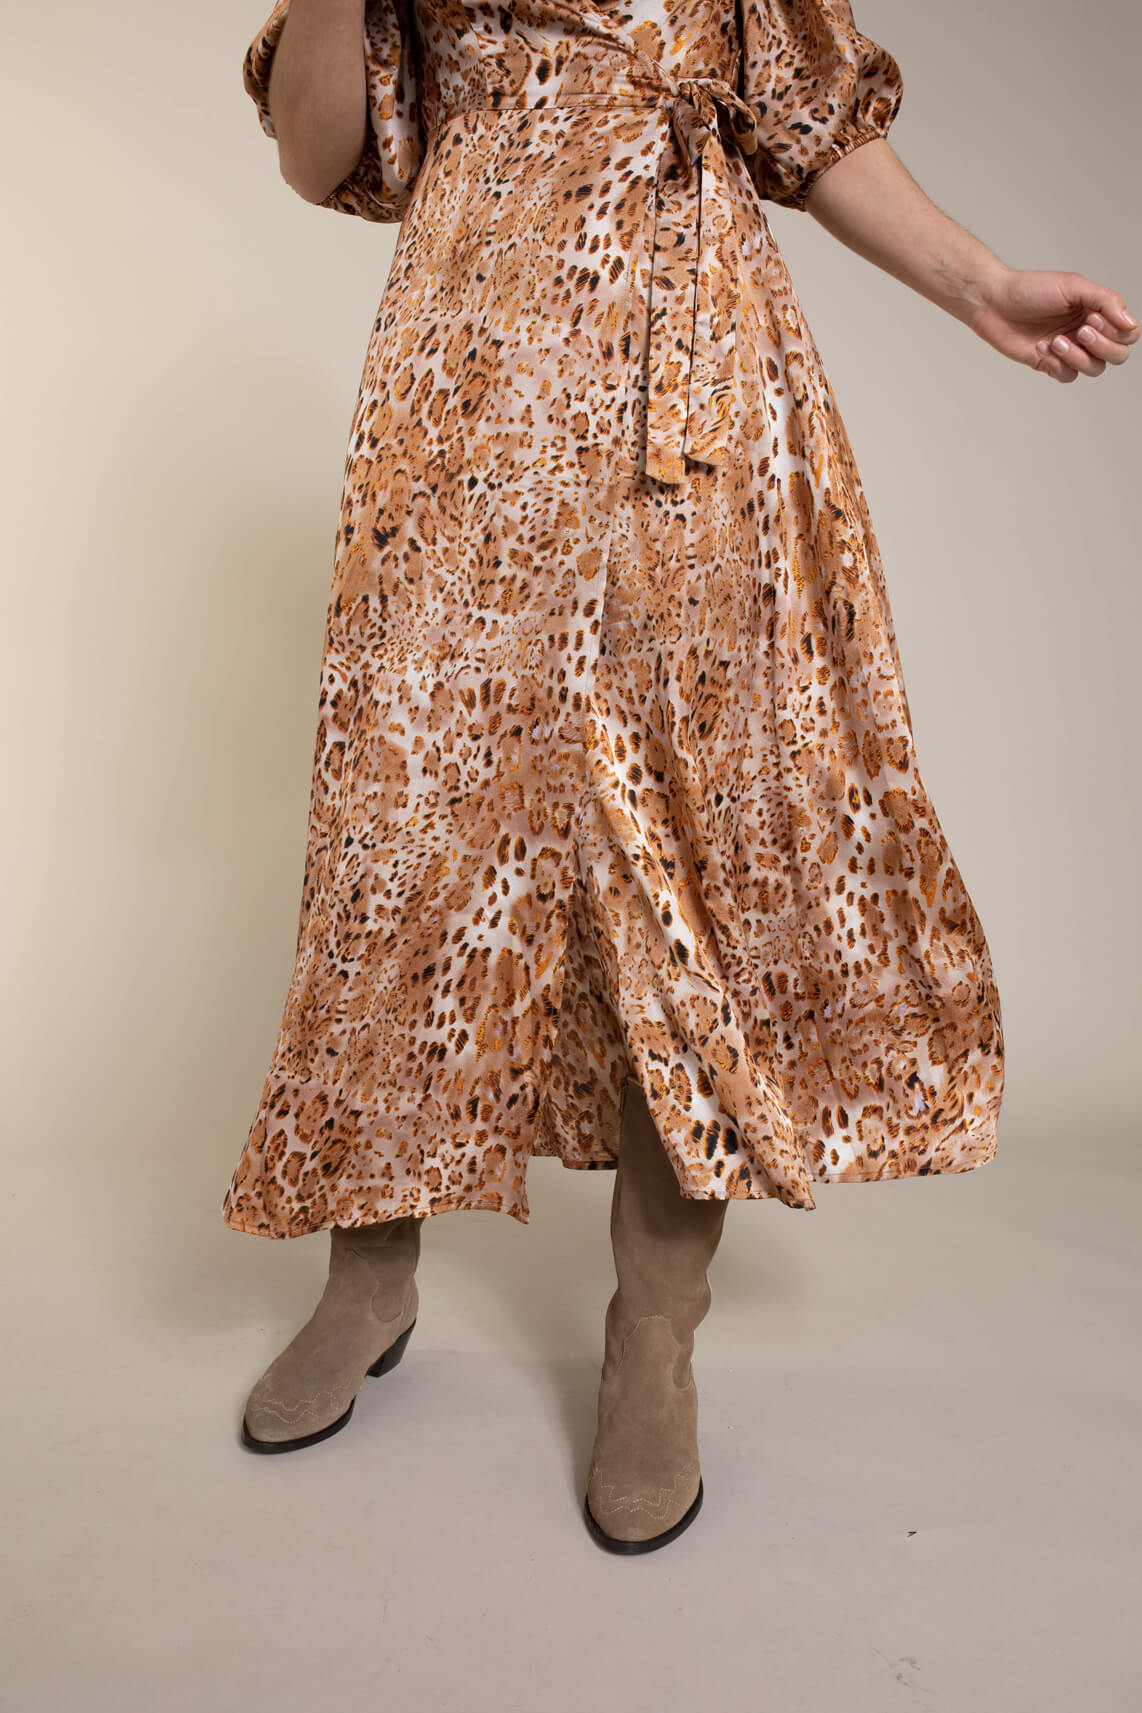 Co Couture Dames Daria overslagjurk Bruin